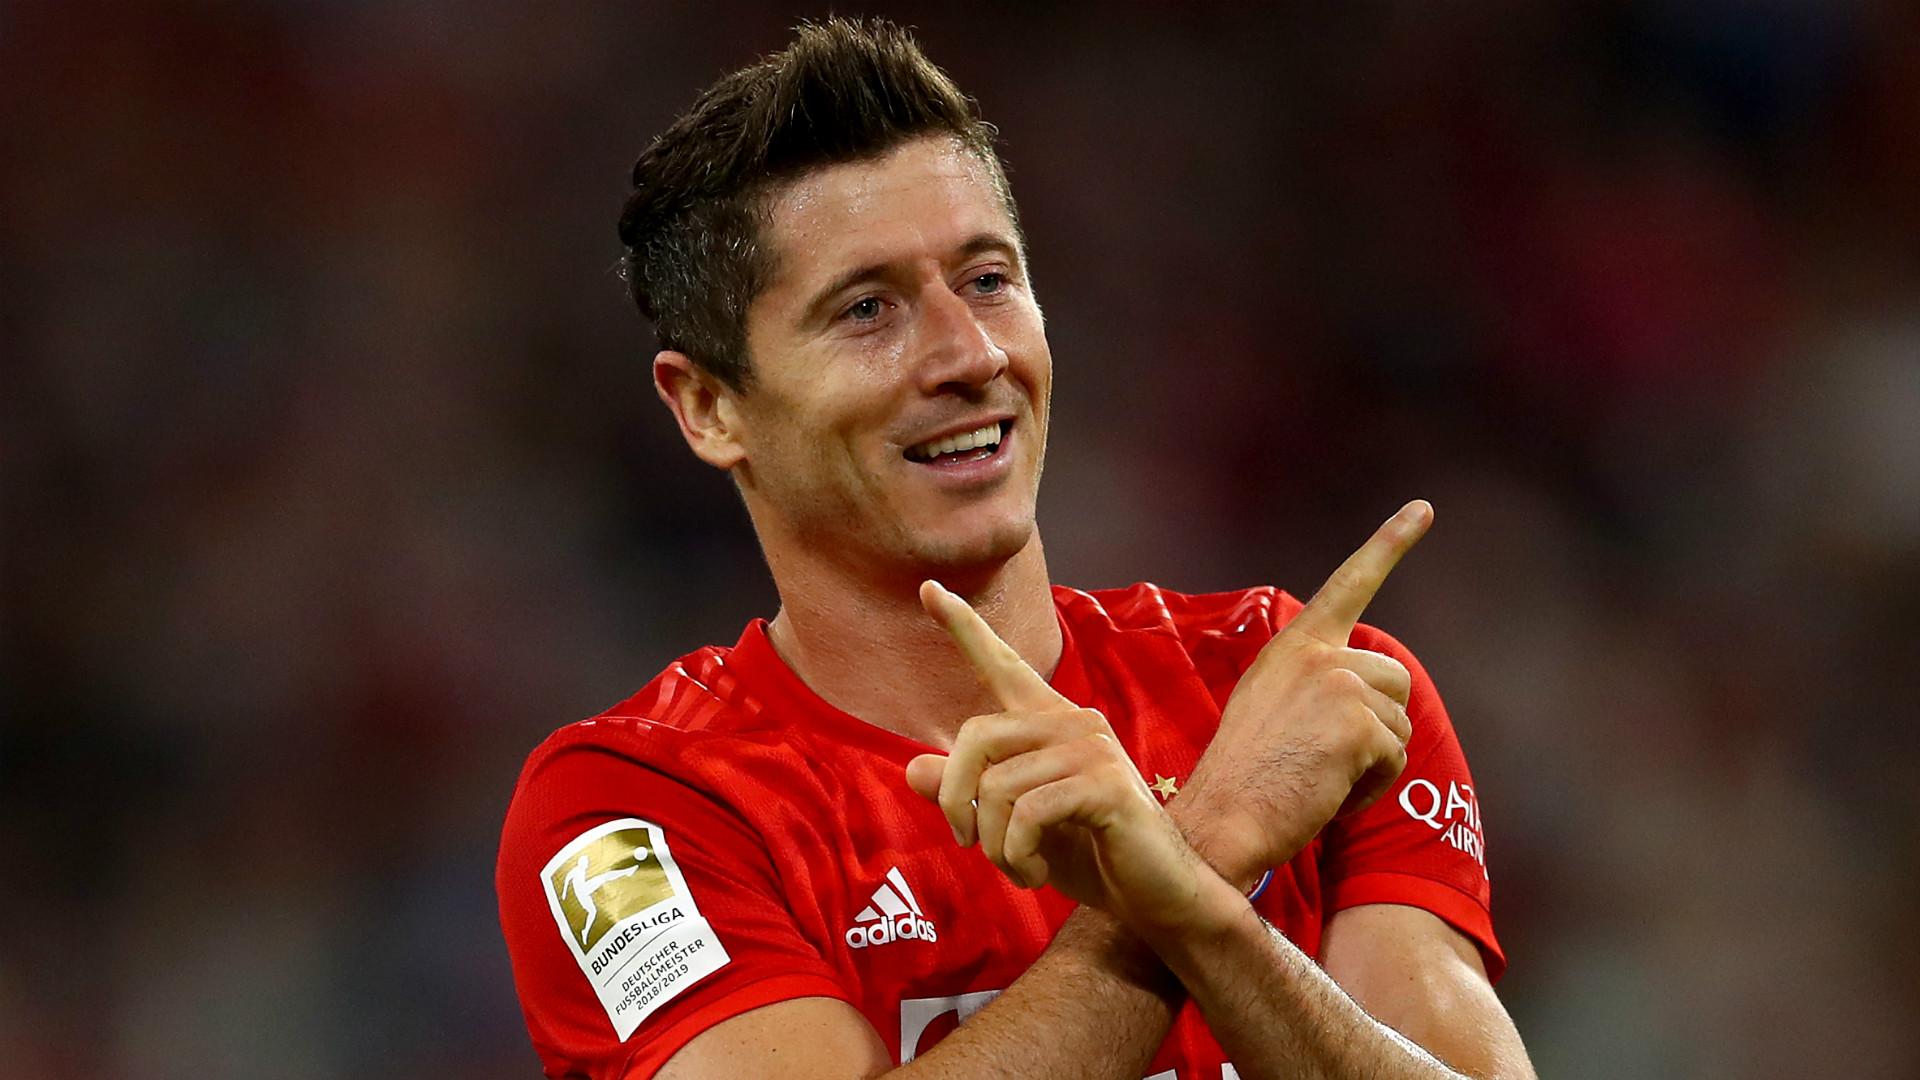 'It's a family secret!' - Lewandowski stays tight-lipped on signature goal celebration as he nears Bayern 200 mark